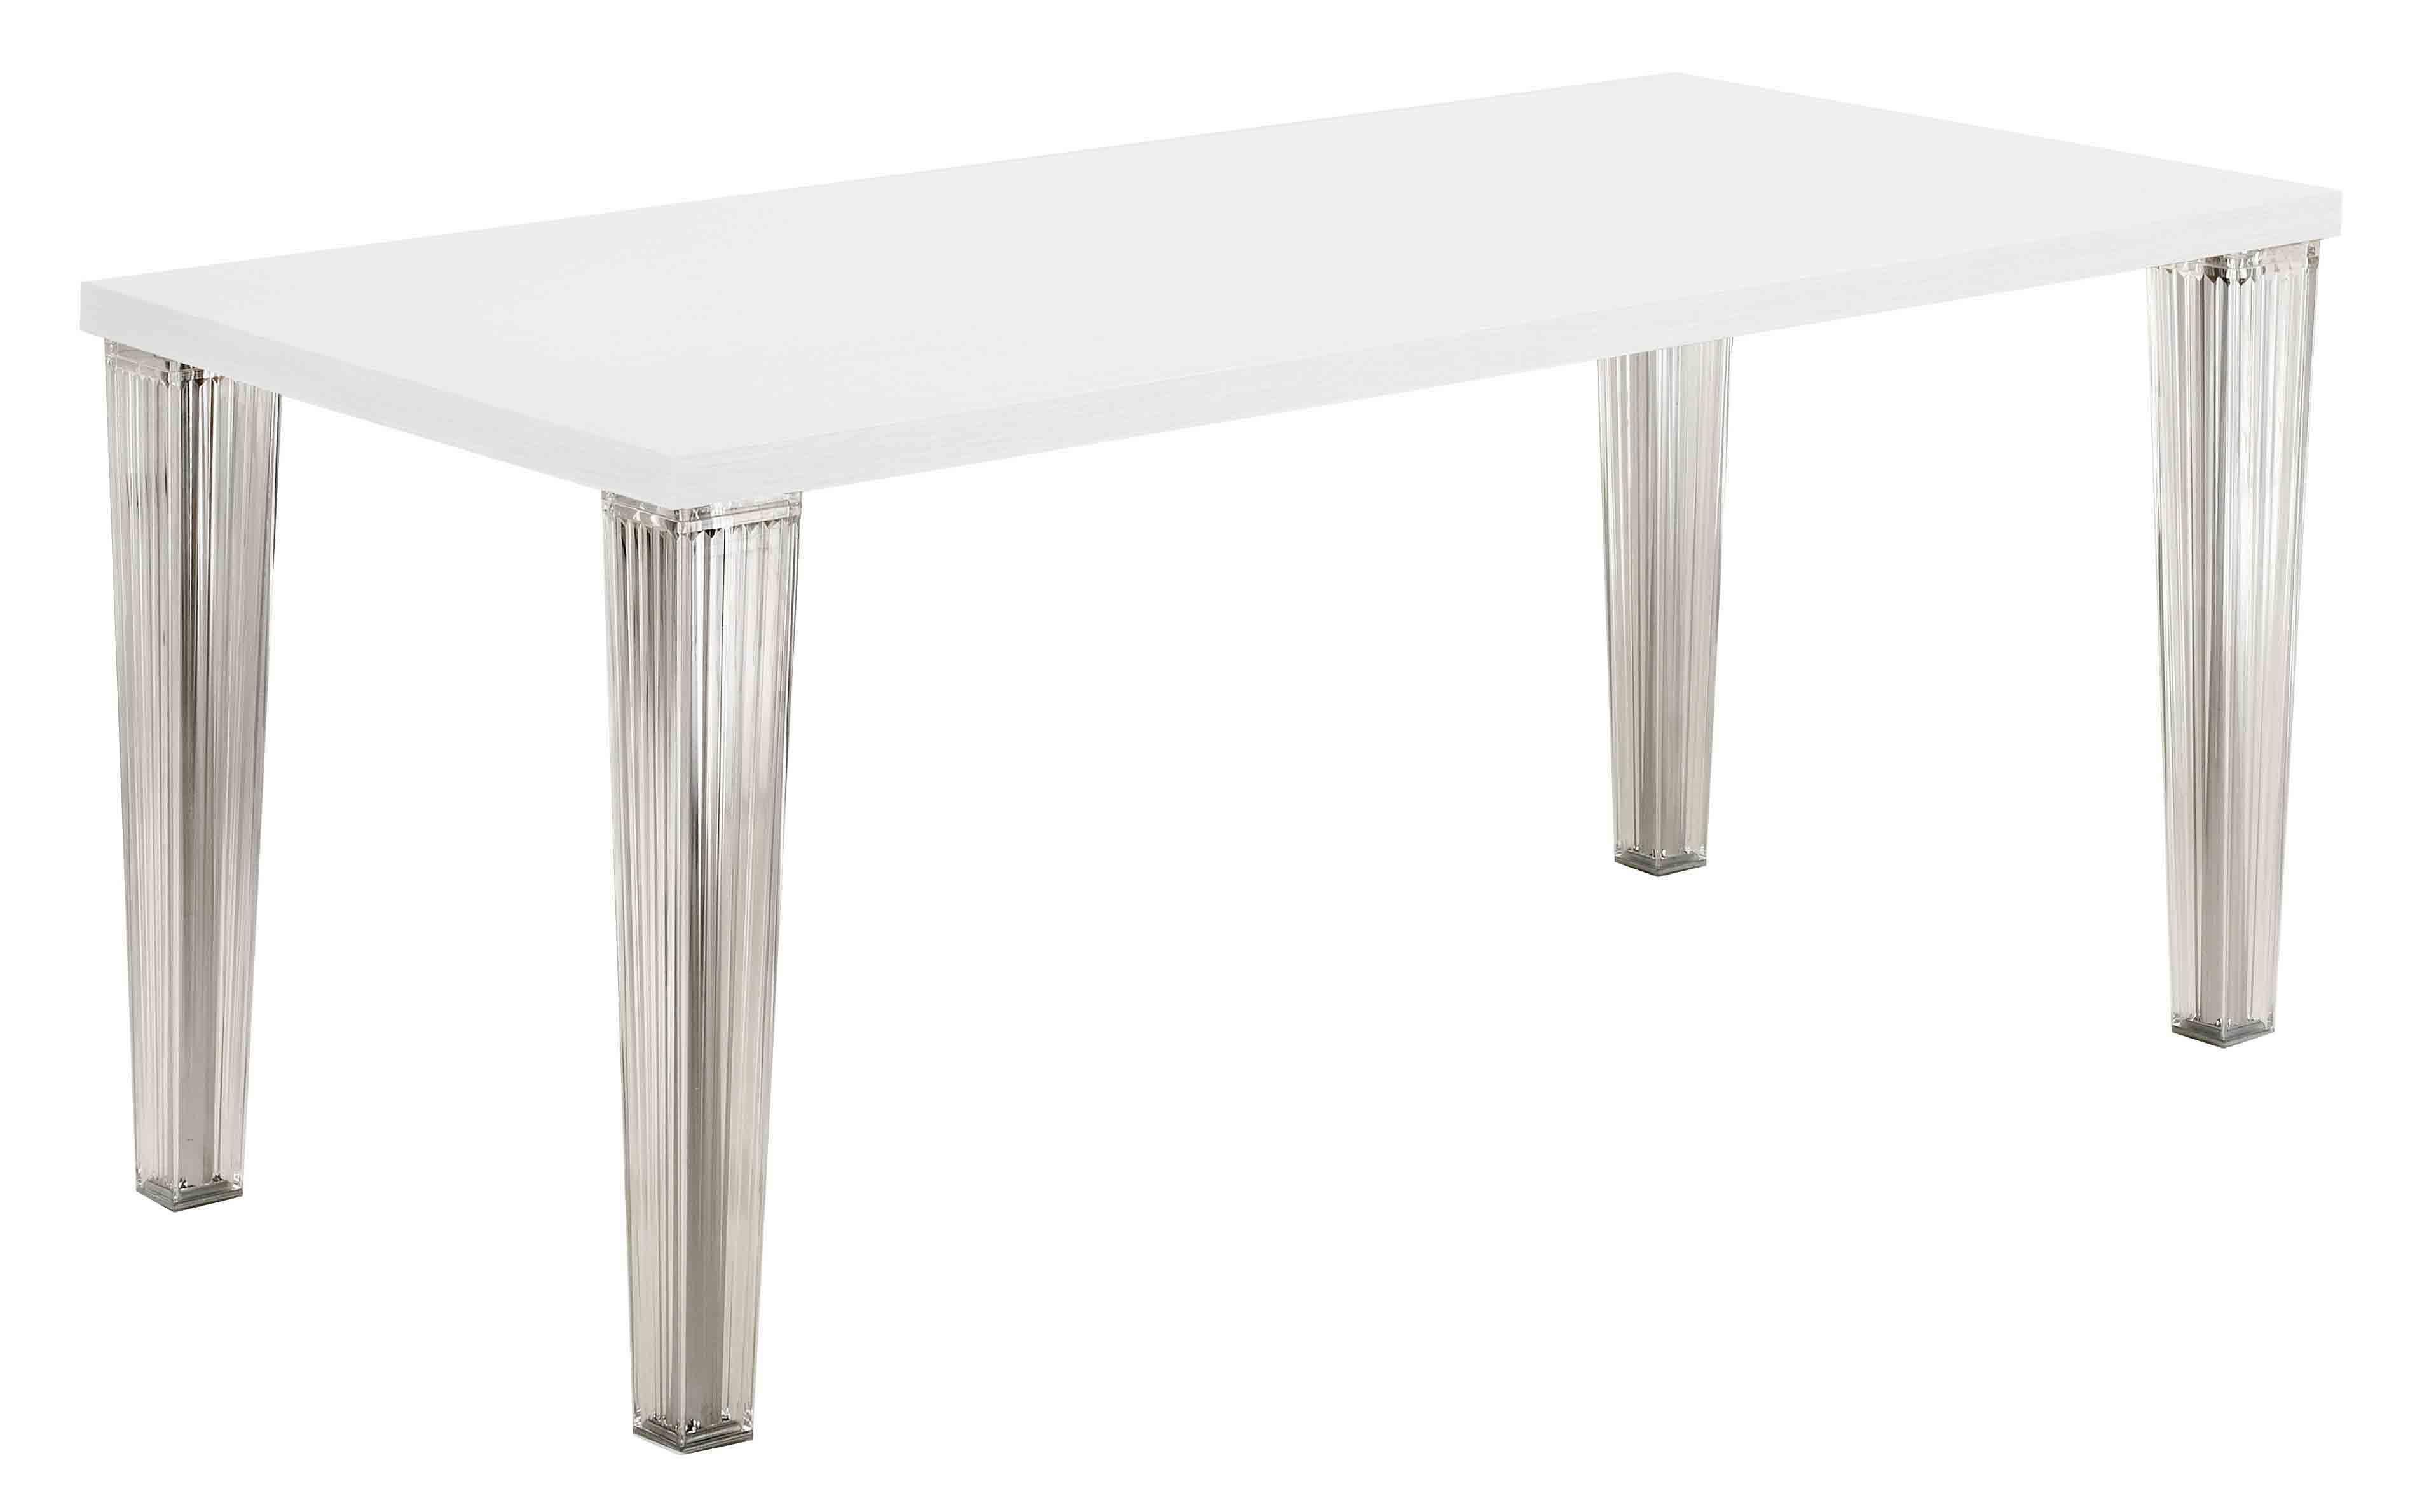 Mobilier - Tables - Table rectangulaire Top Top / Laquée - L 160 cm - Kartell - Blanc - Polycarbonate, Polyester laqué